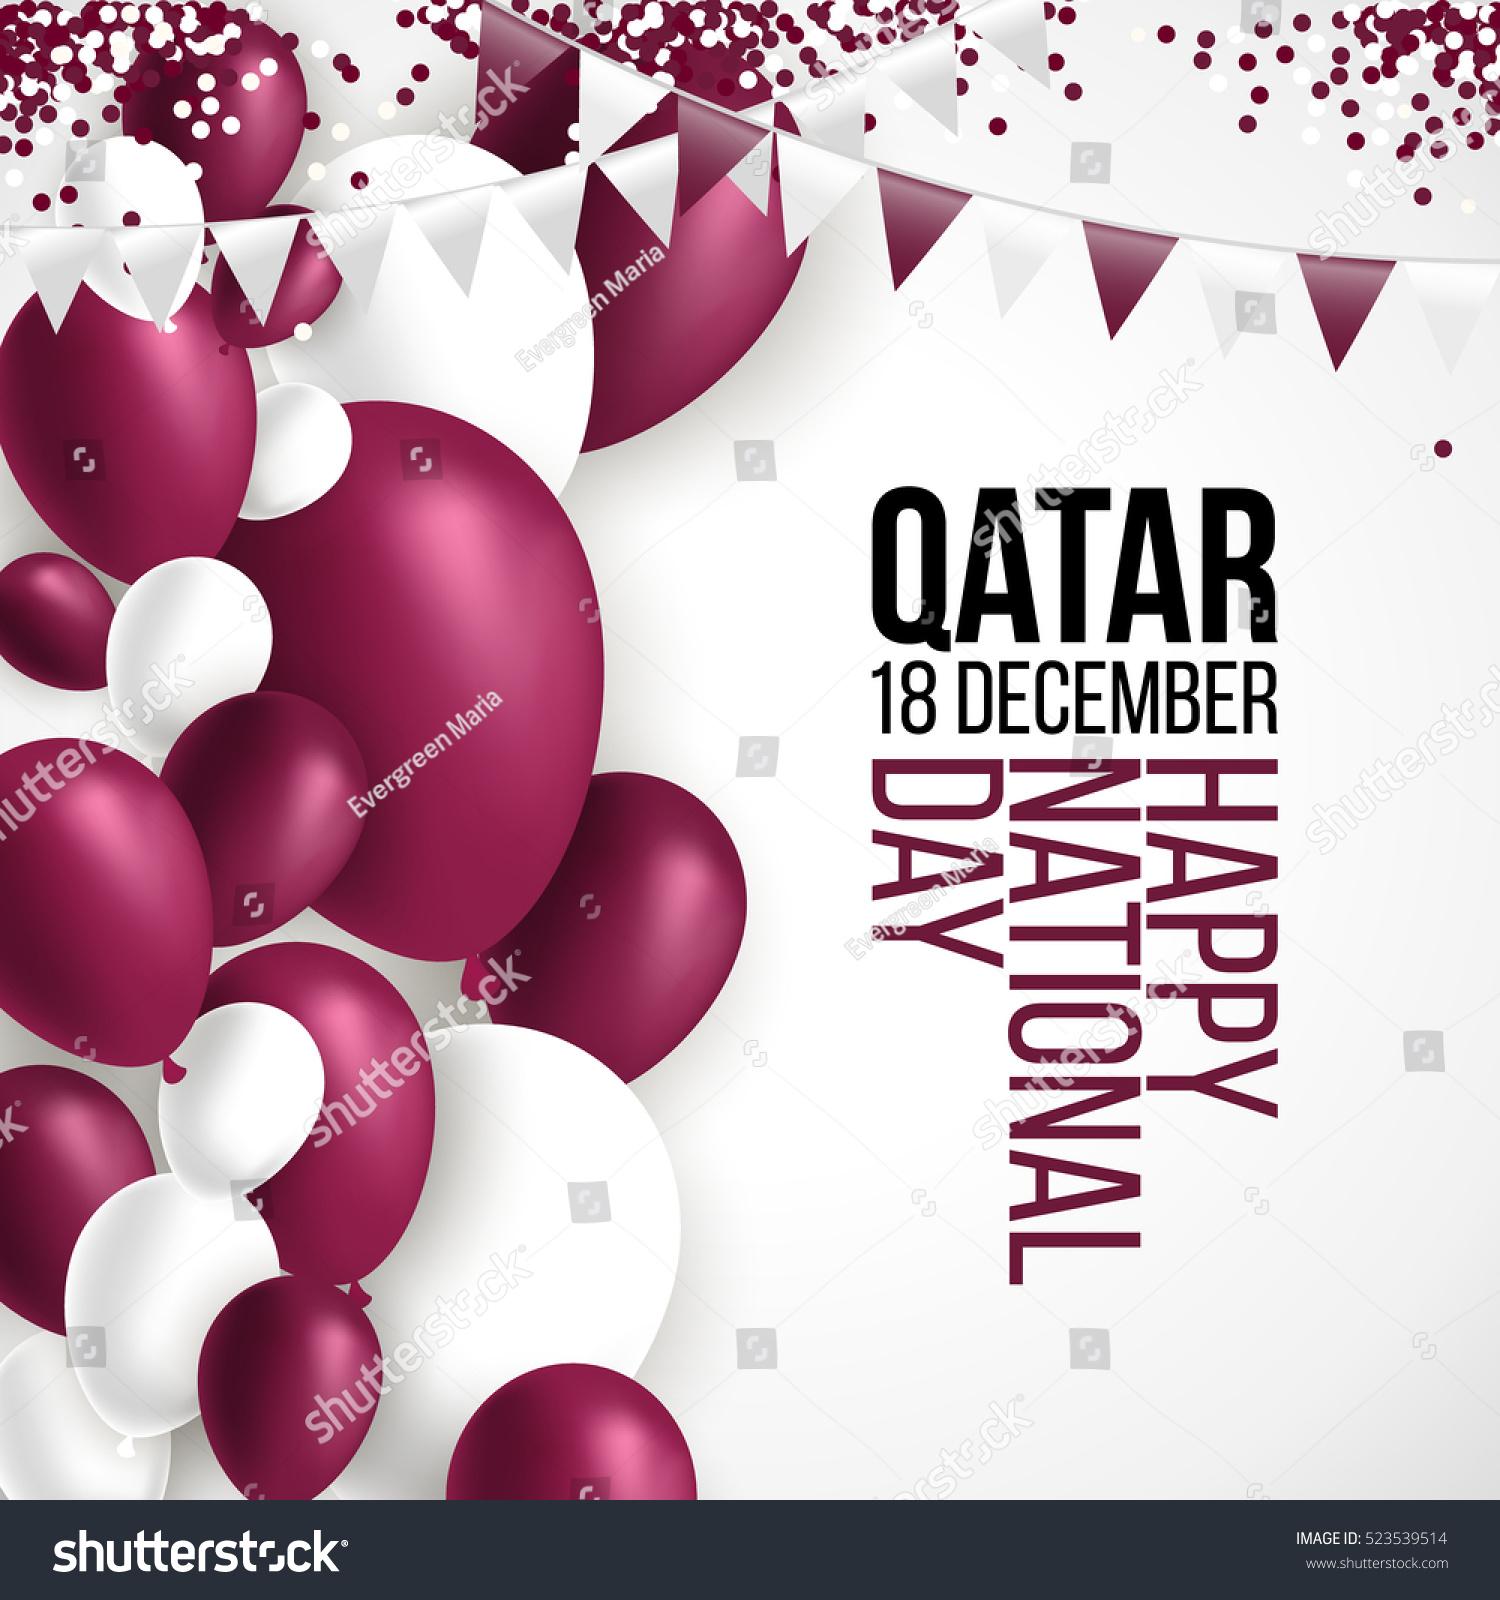 Balloon Decoration Qatar